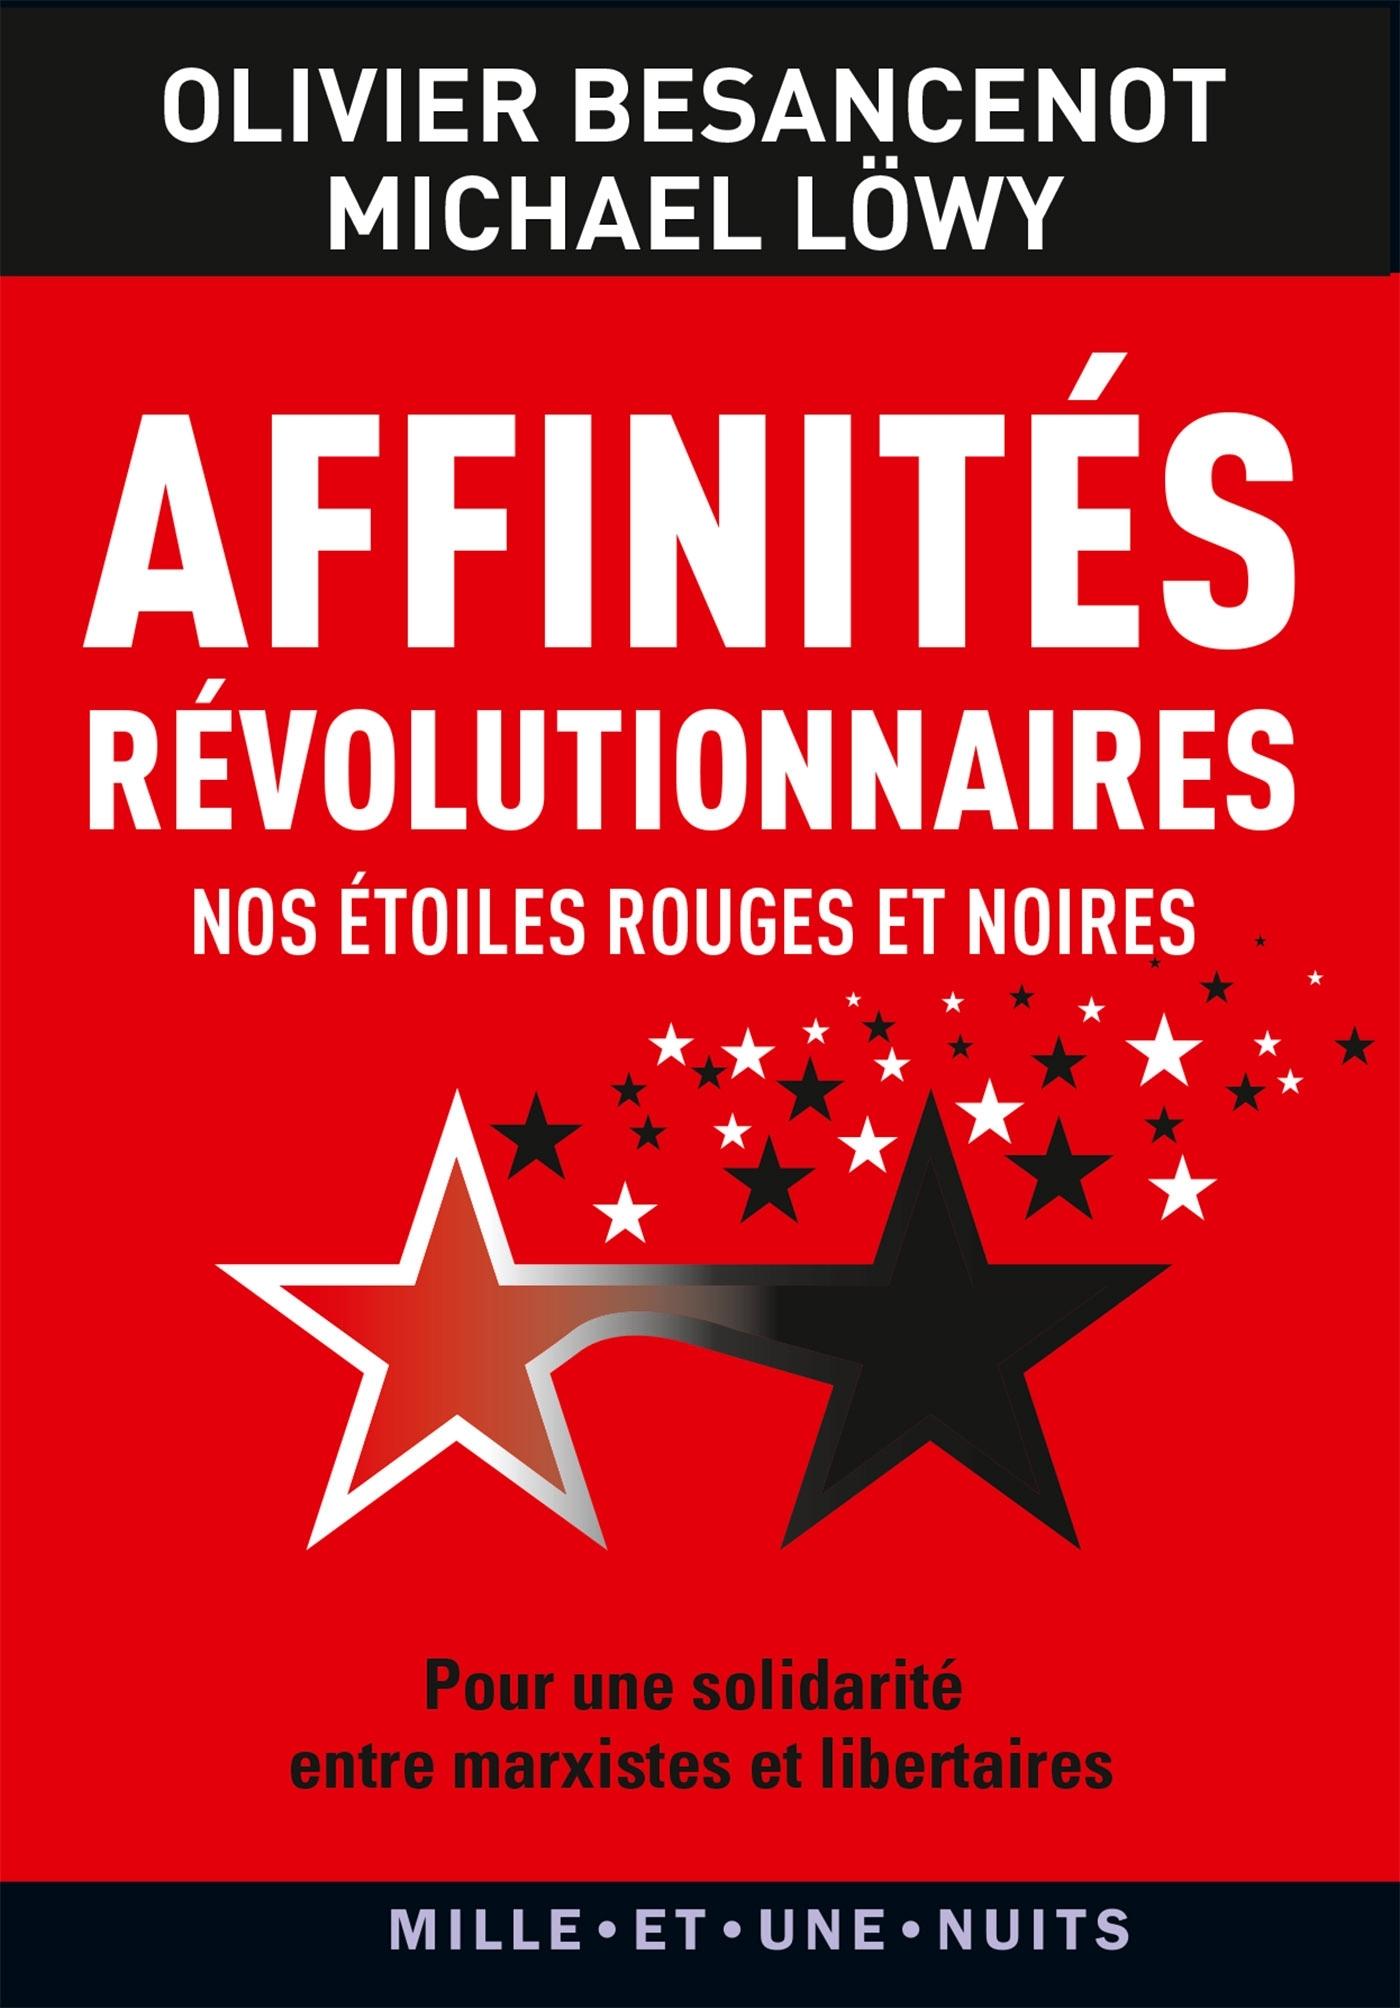 AFFINITES REVOLUTIONNAIRES